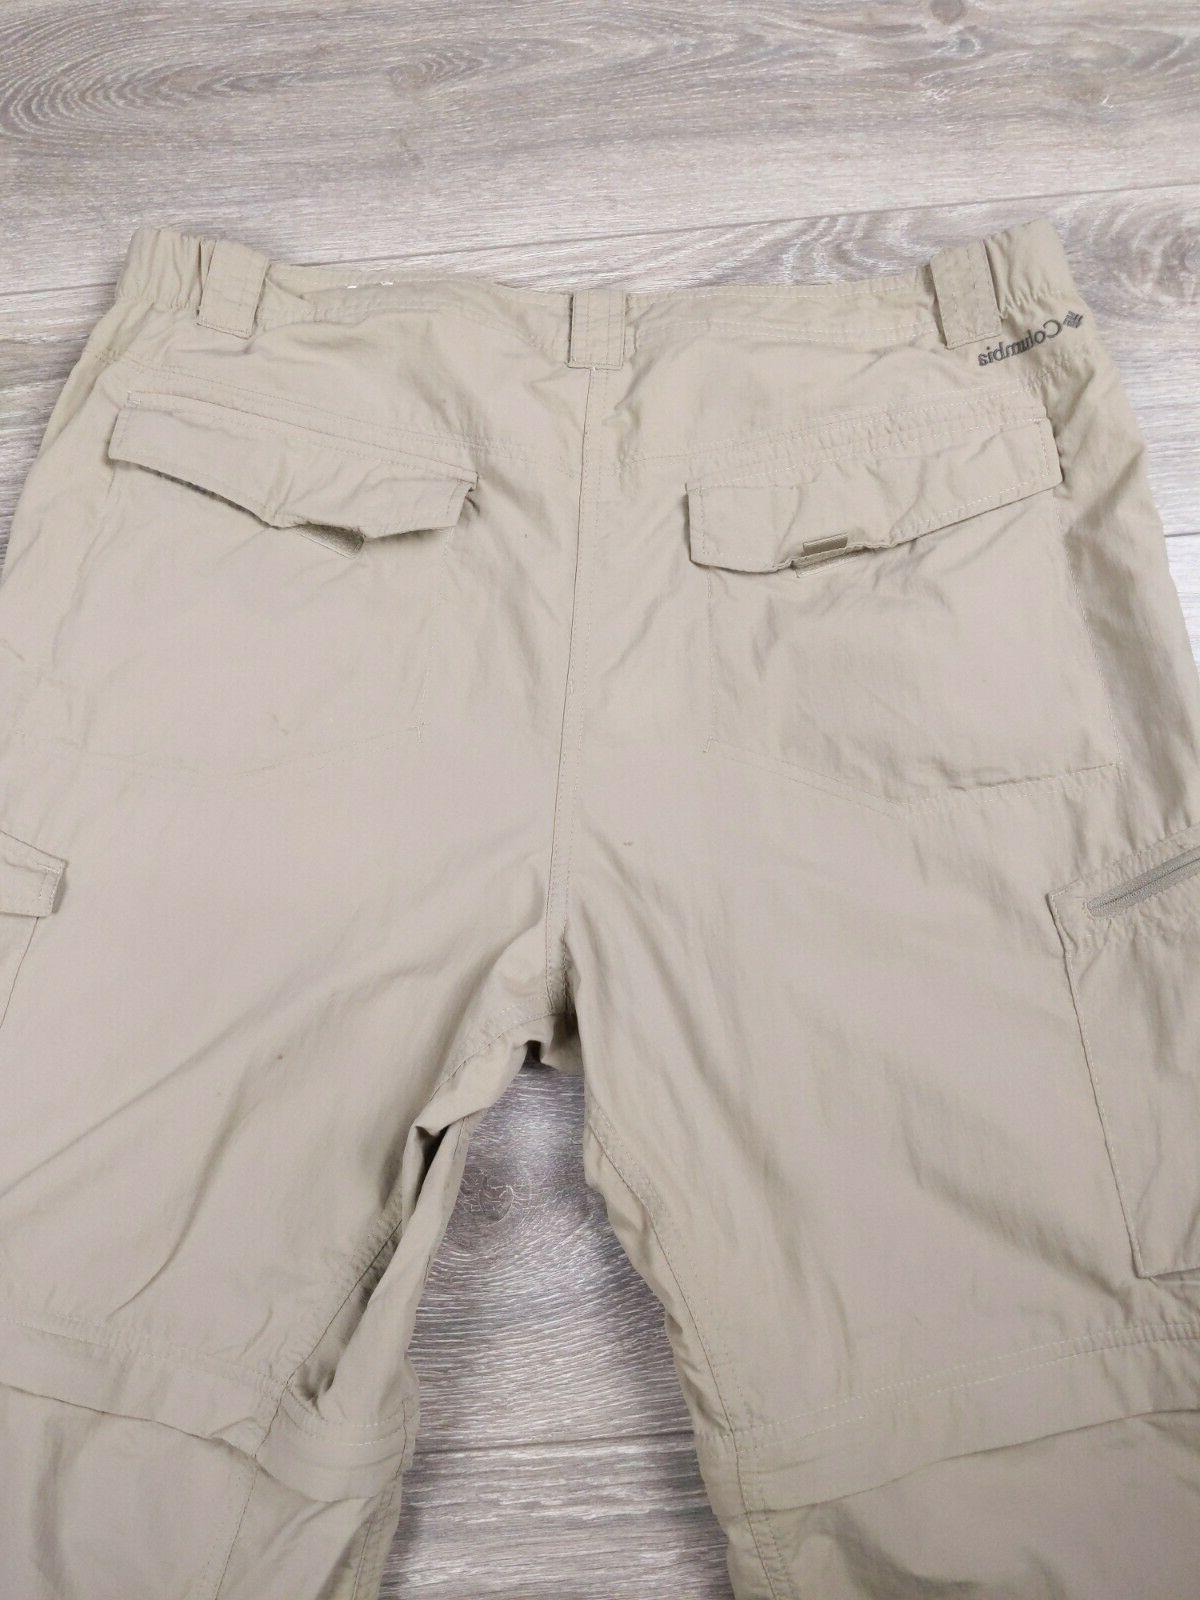 Columbia Omni-Shade Convertible Hiking Cargo Pants Men's 40 34 Tan